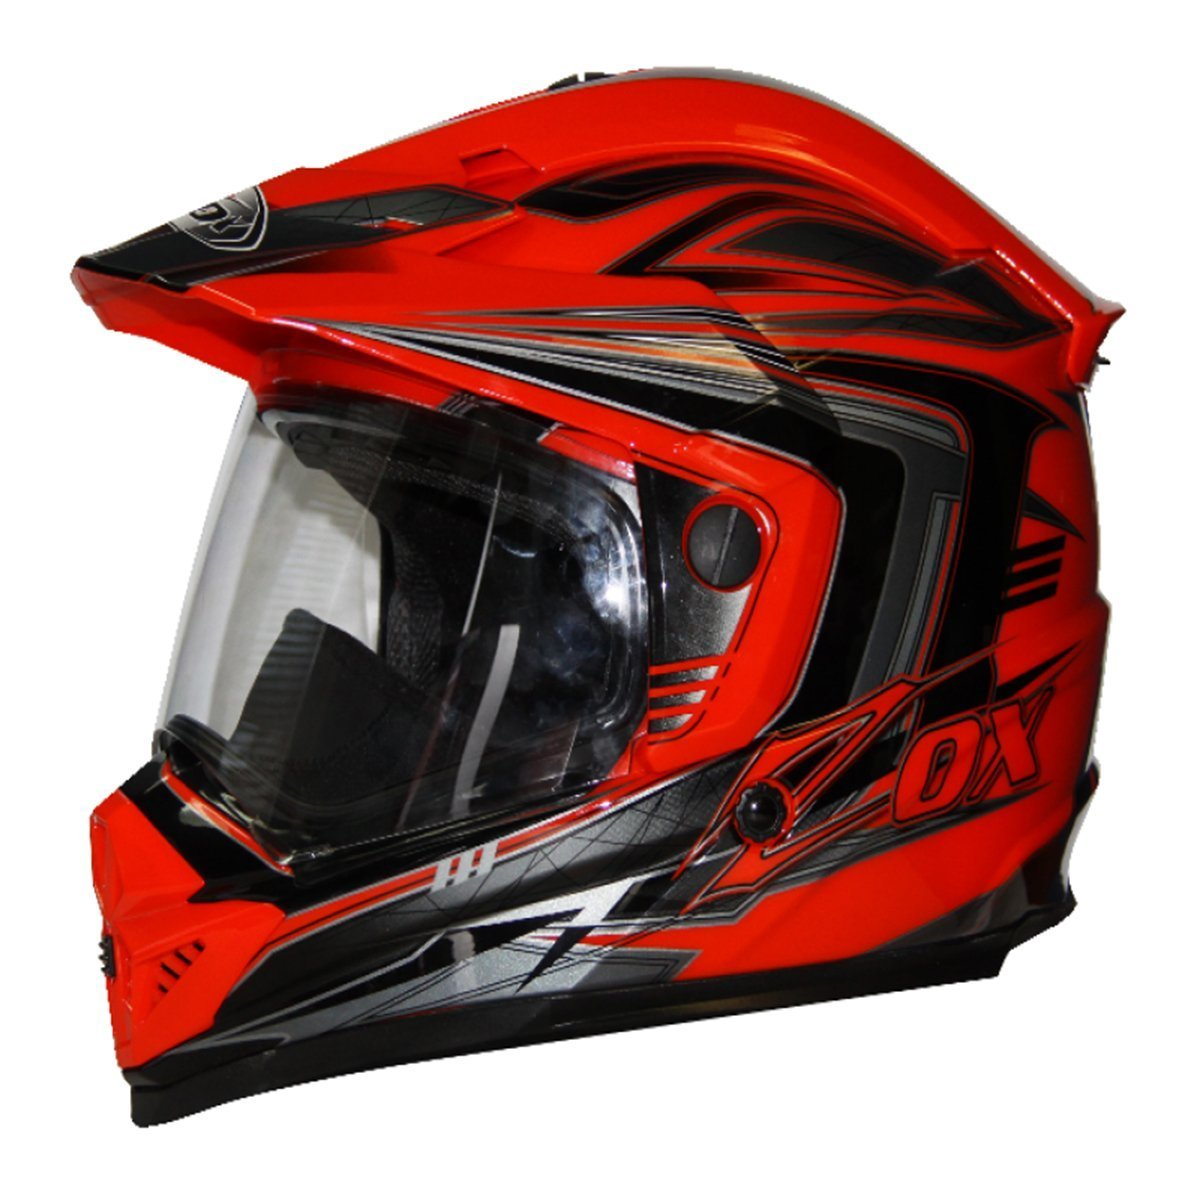 Prime Dark, Silver, Large Zox Rush SFX Full Face Multi-Purpose Motorcycle Helmet w//Visor Motorcycle ATV Off Road MX Enduro